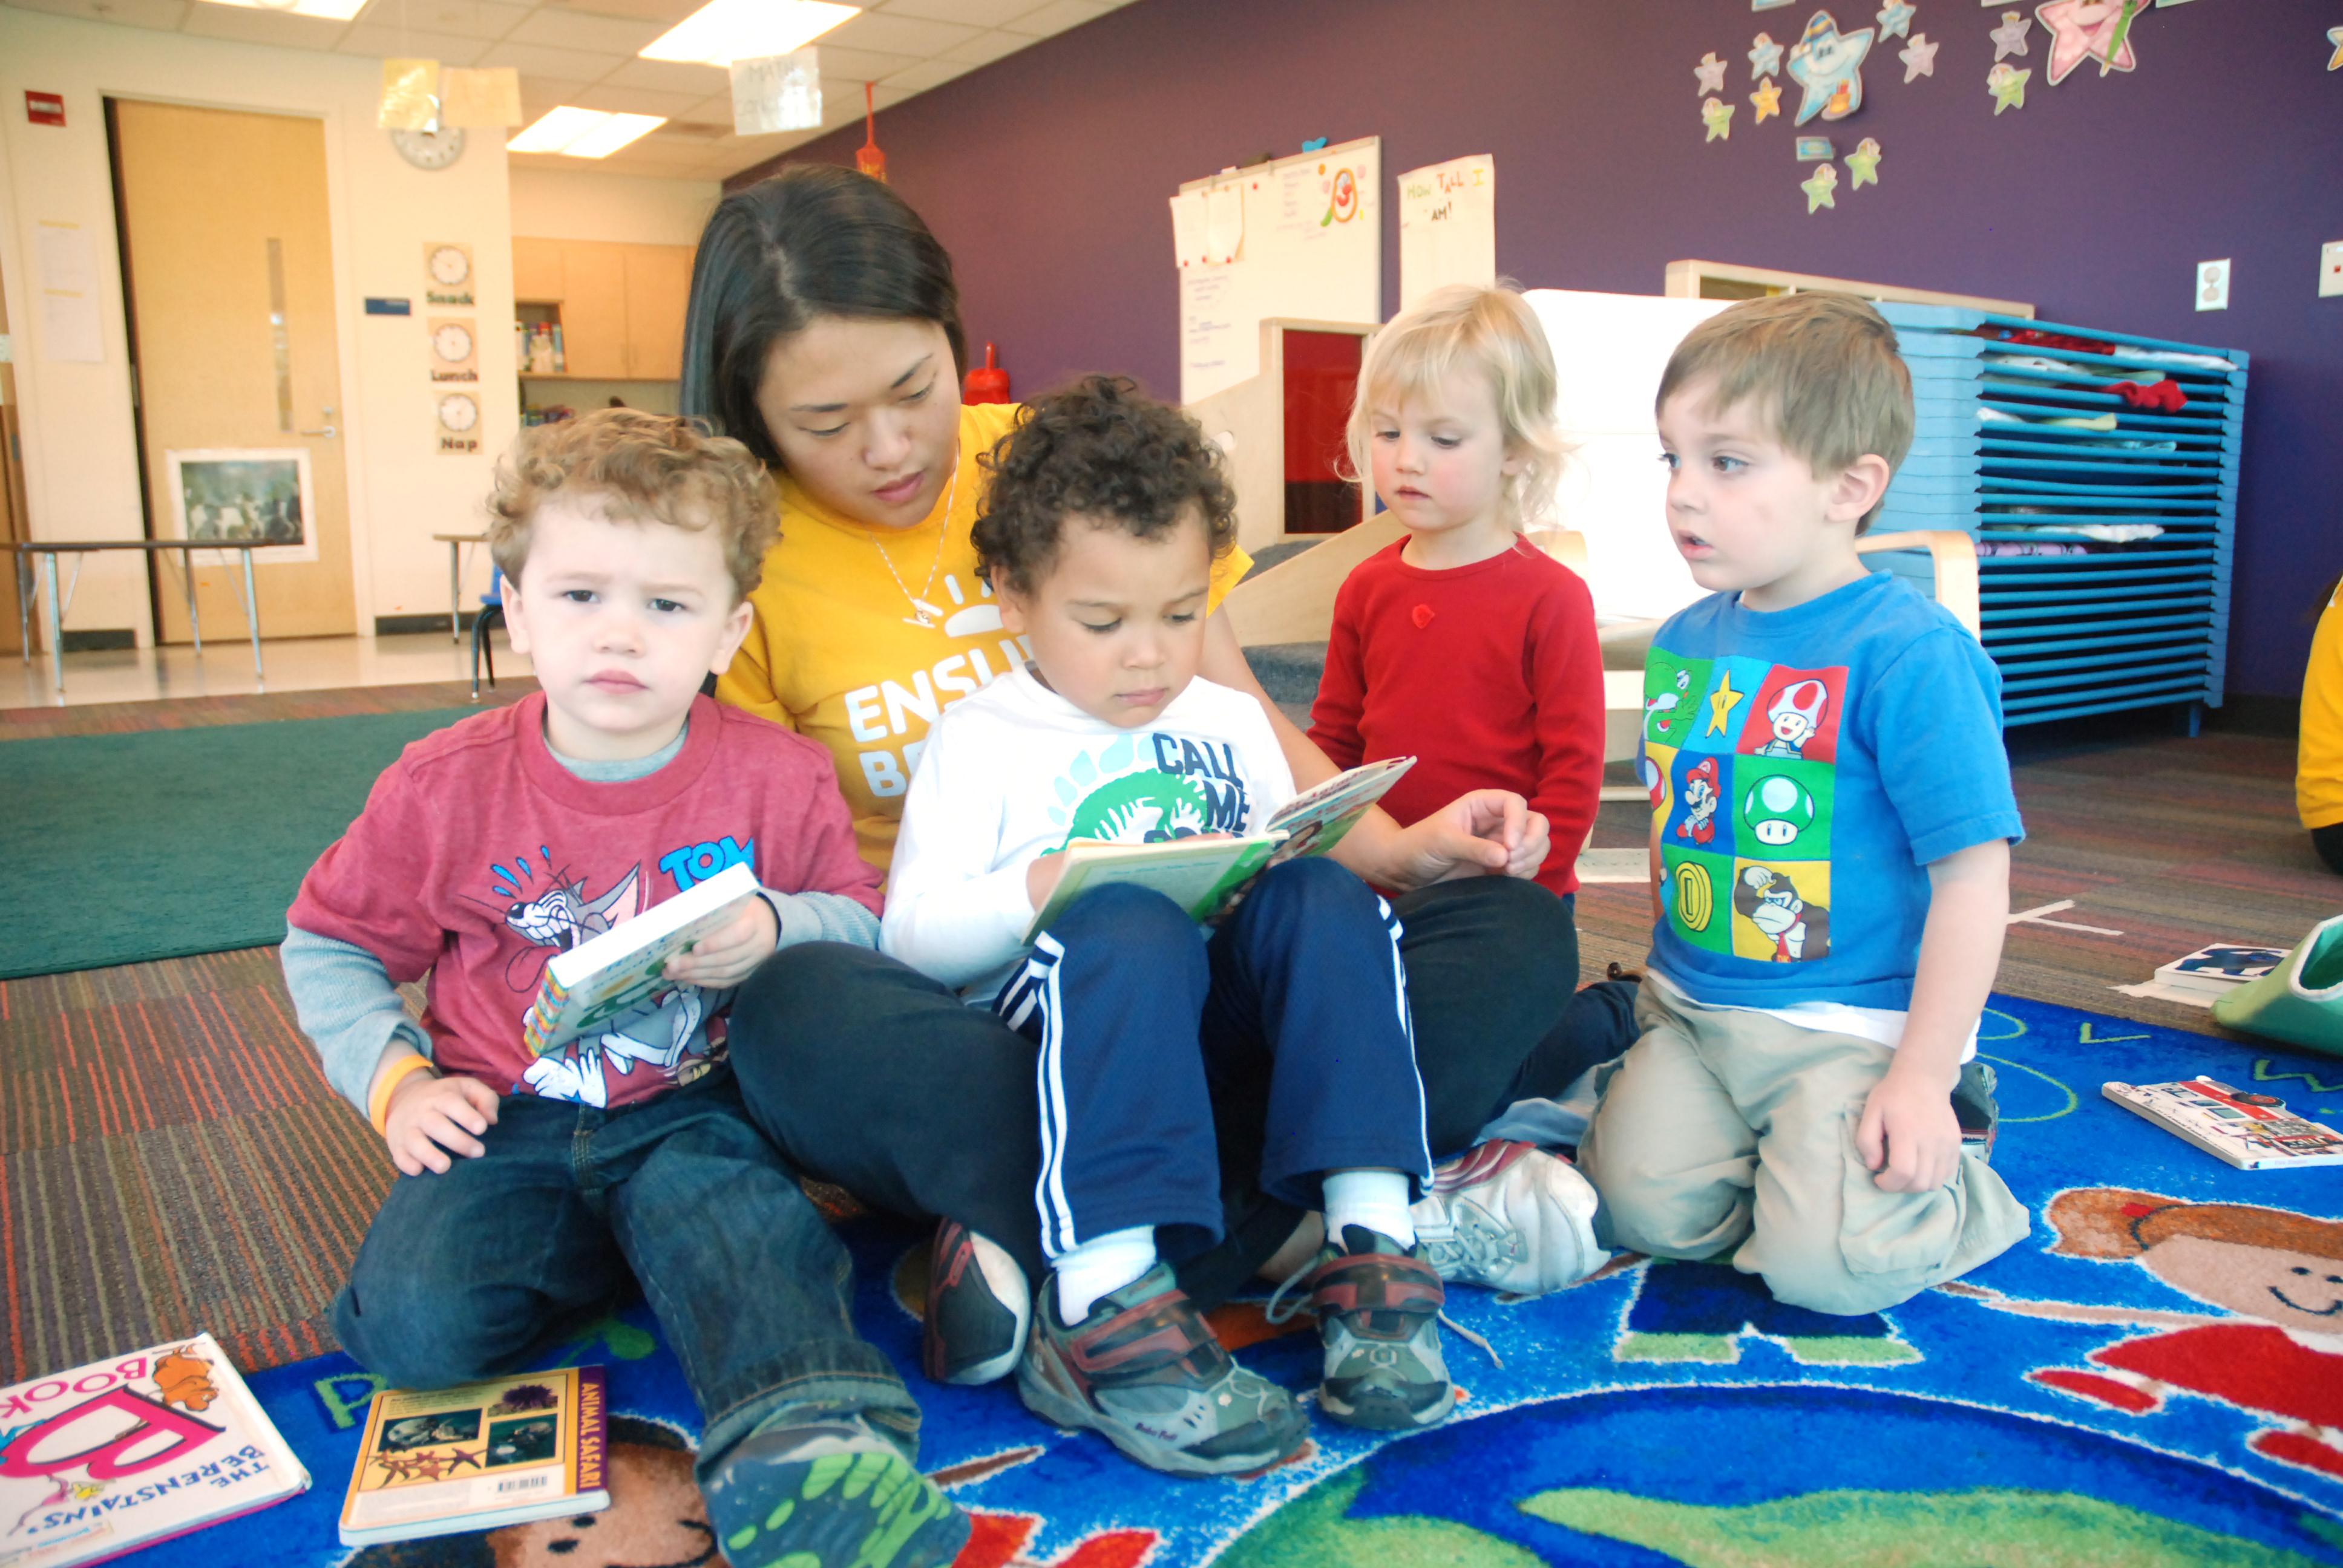 Ann Arbor Ymca Child Development Center